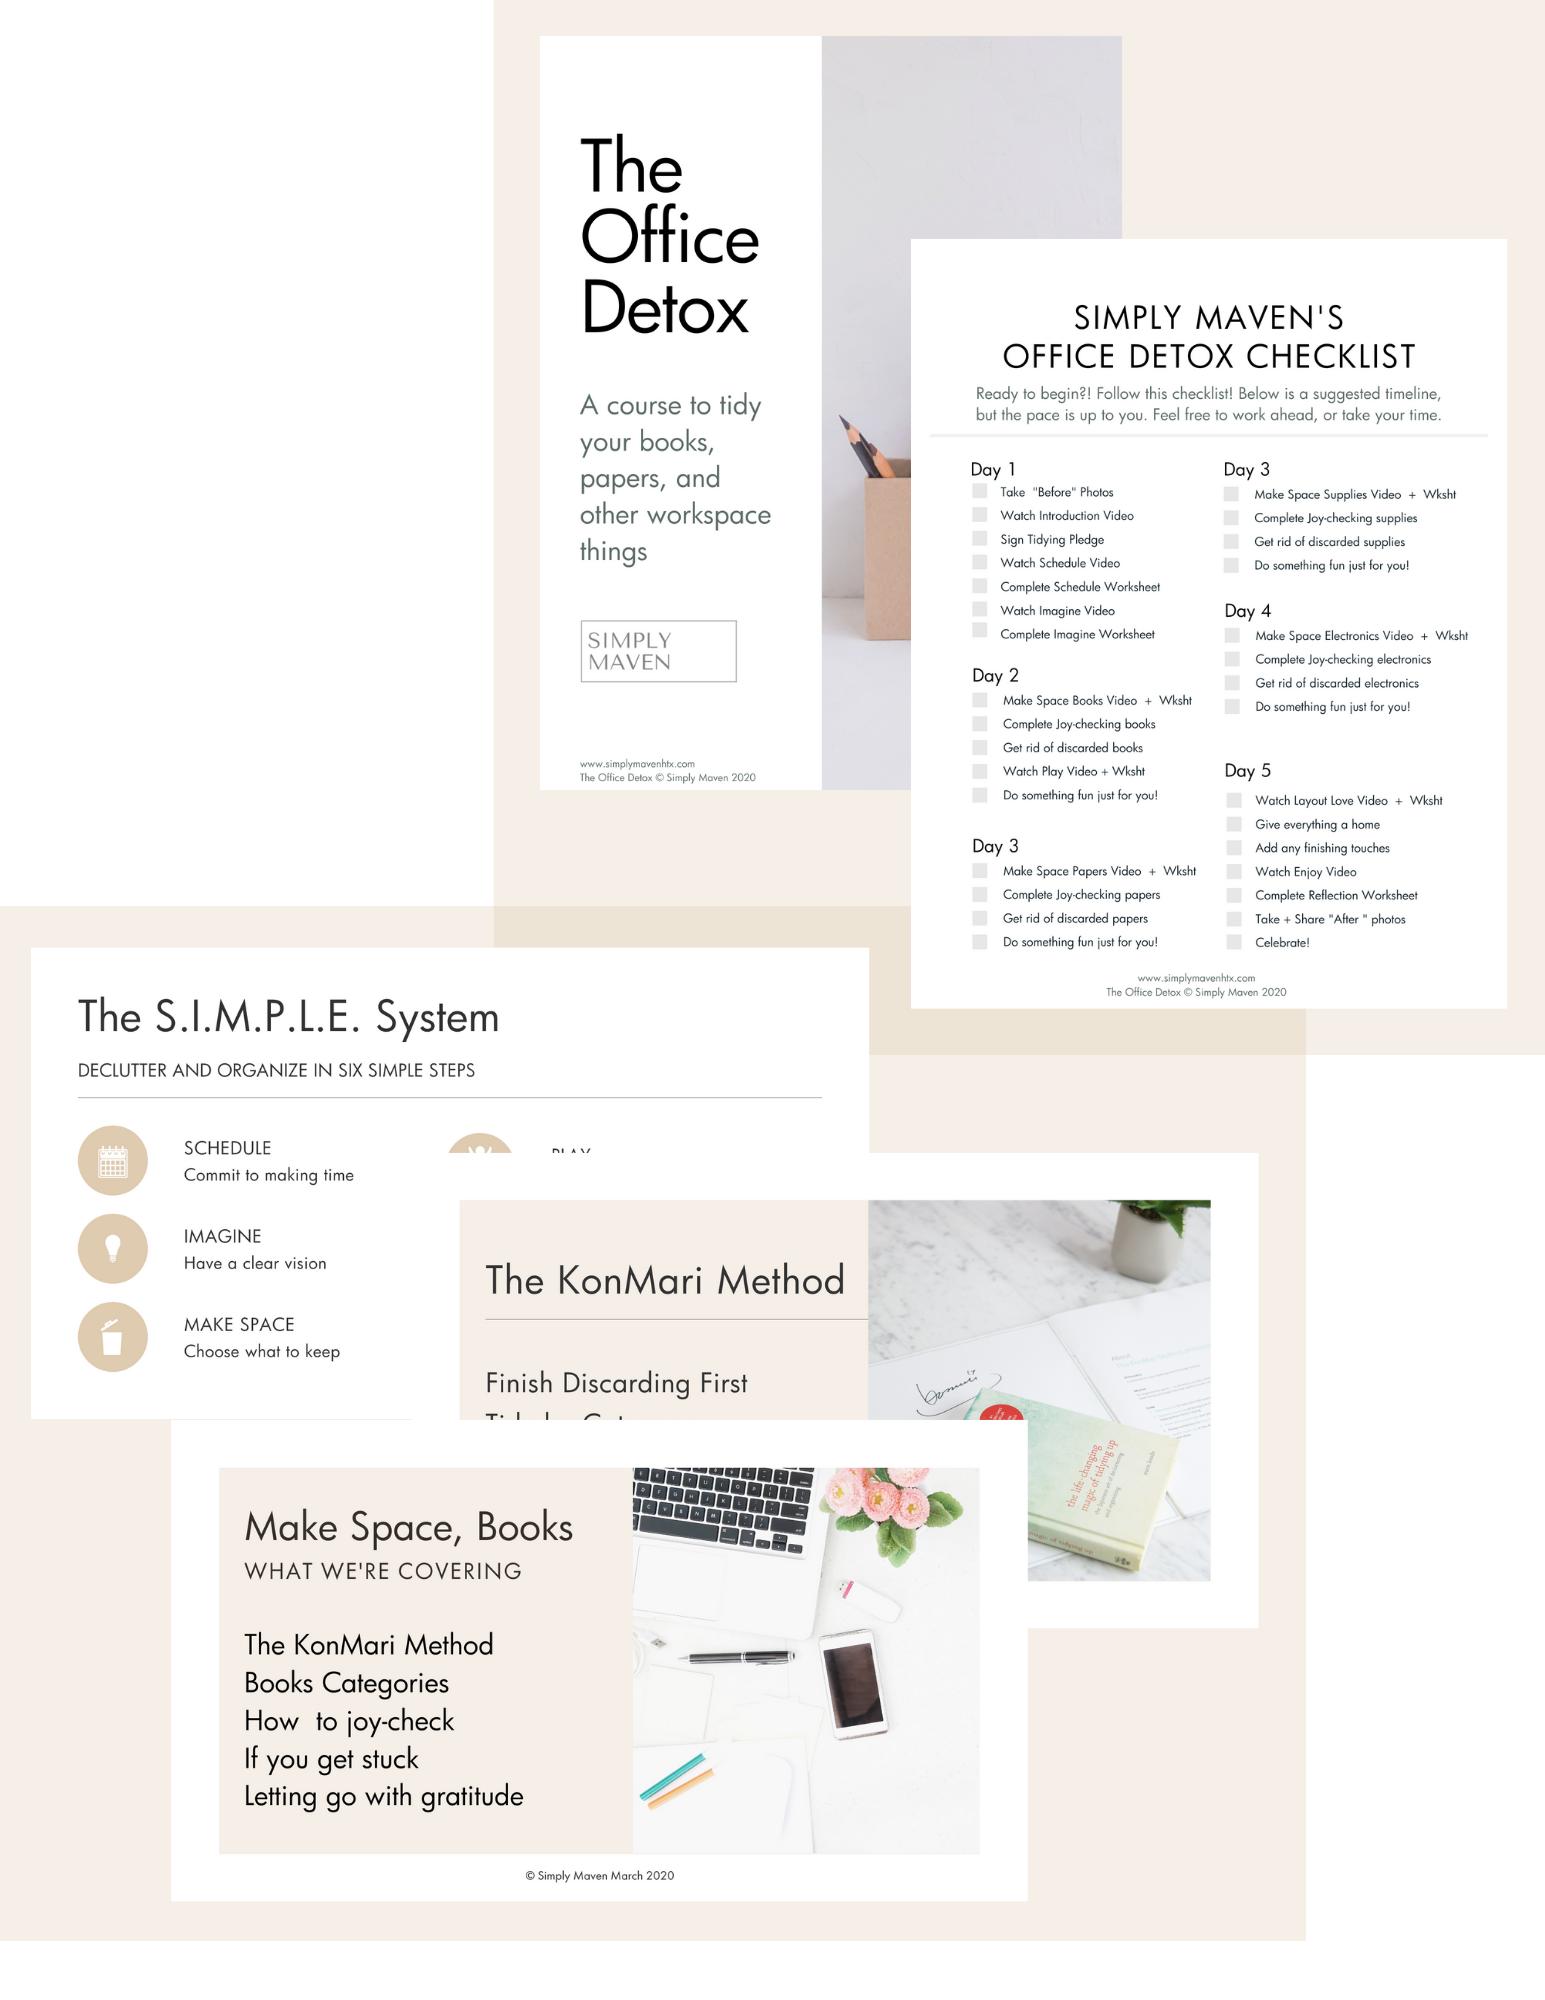 The Closet Detox - Online Course to KonMari your Clothes